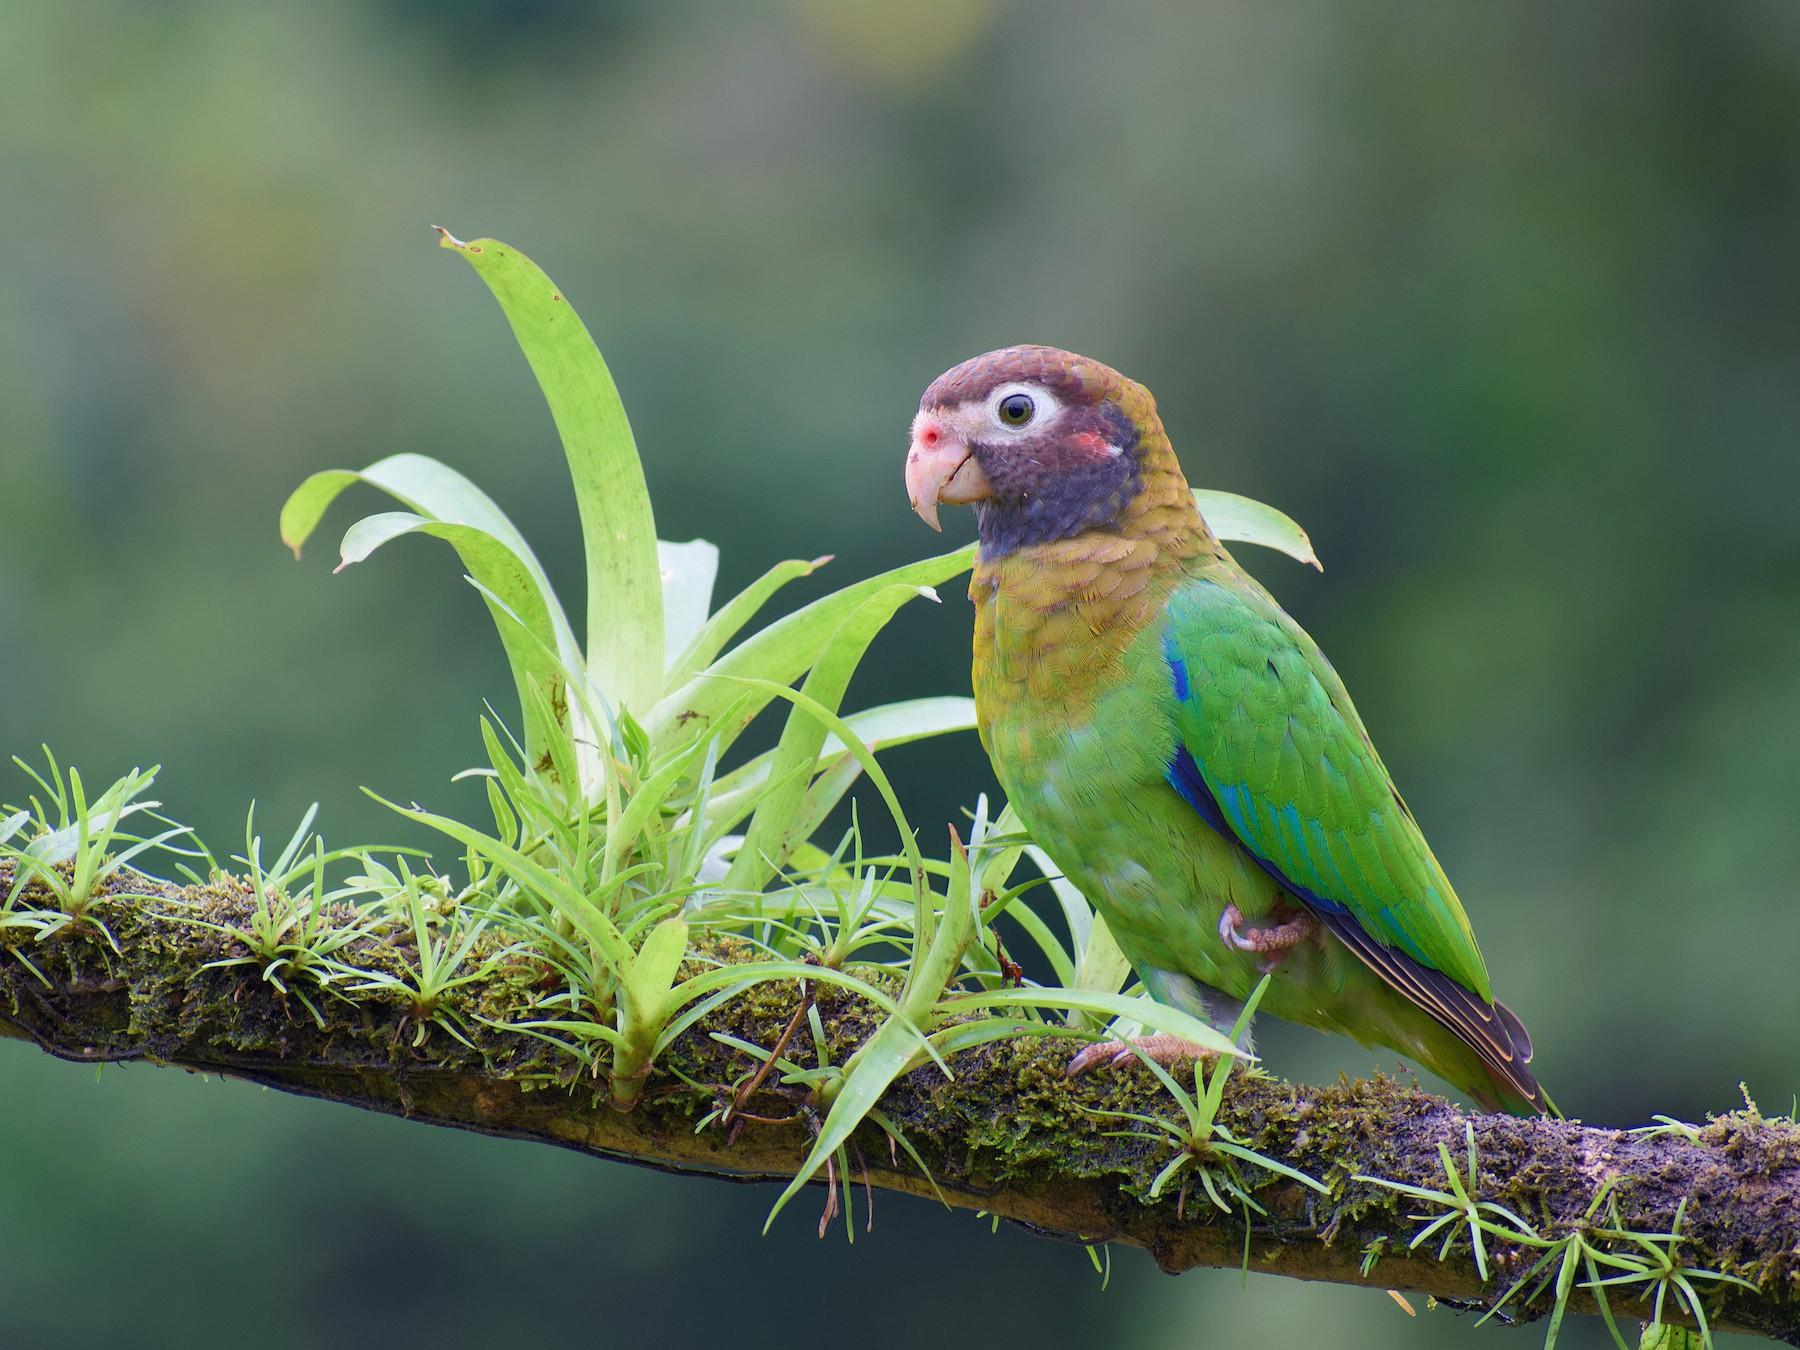 Brown-hooded Parrot - Chistopher Becerra